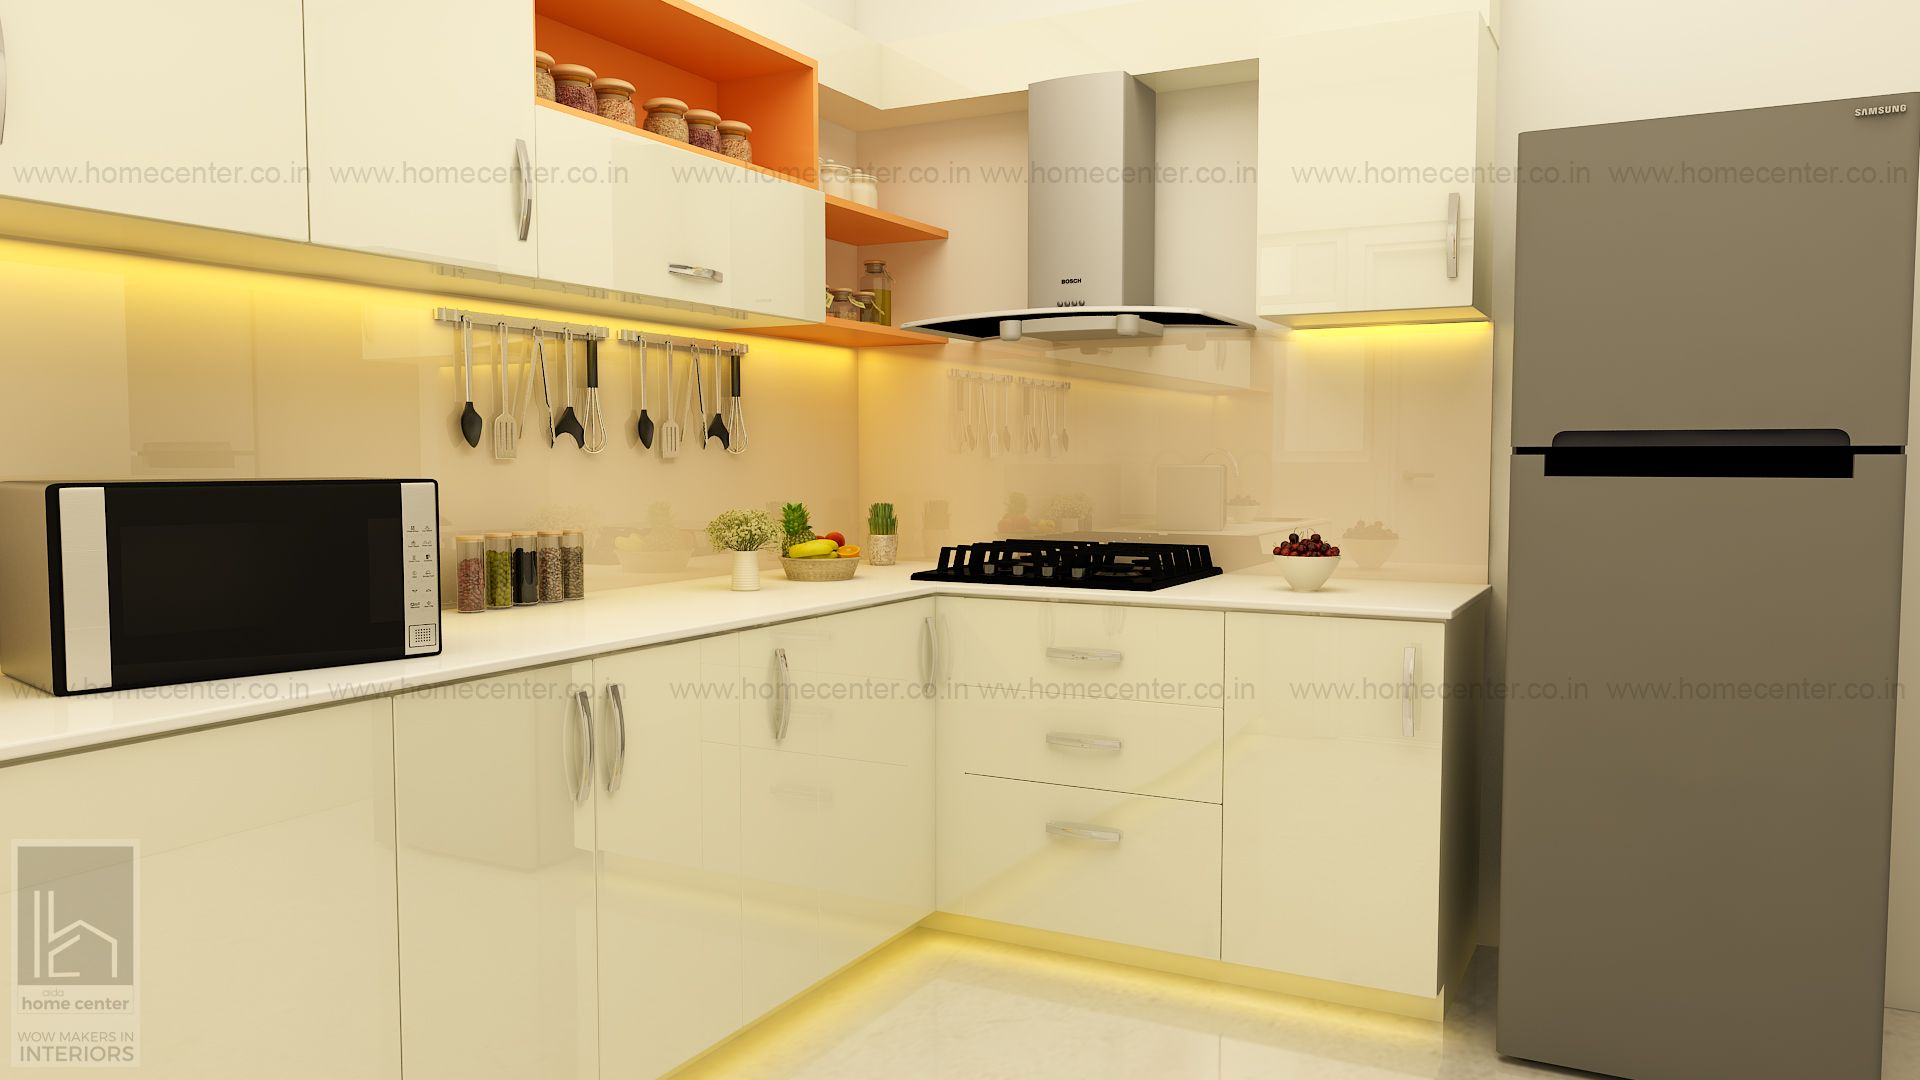 Find Best Interior Designers in Kerala ✓ Get Instant